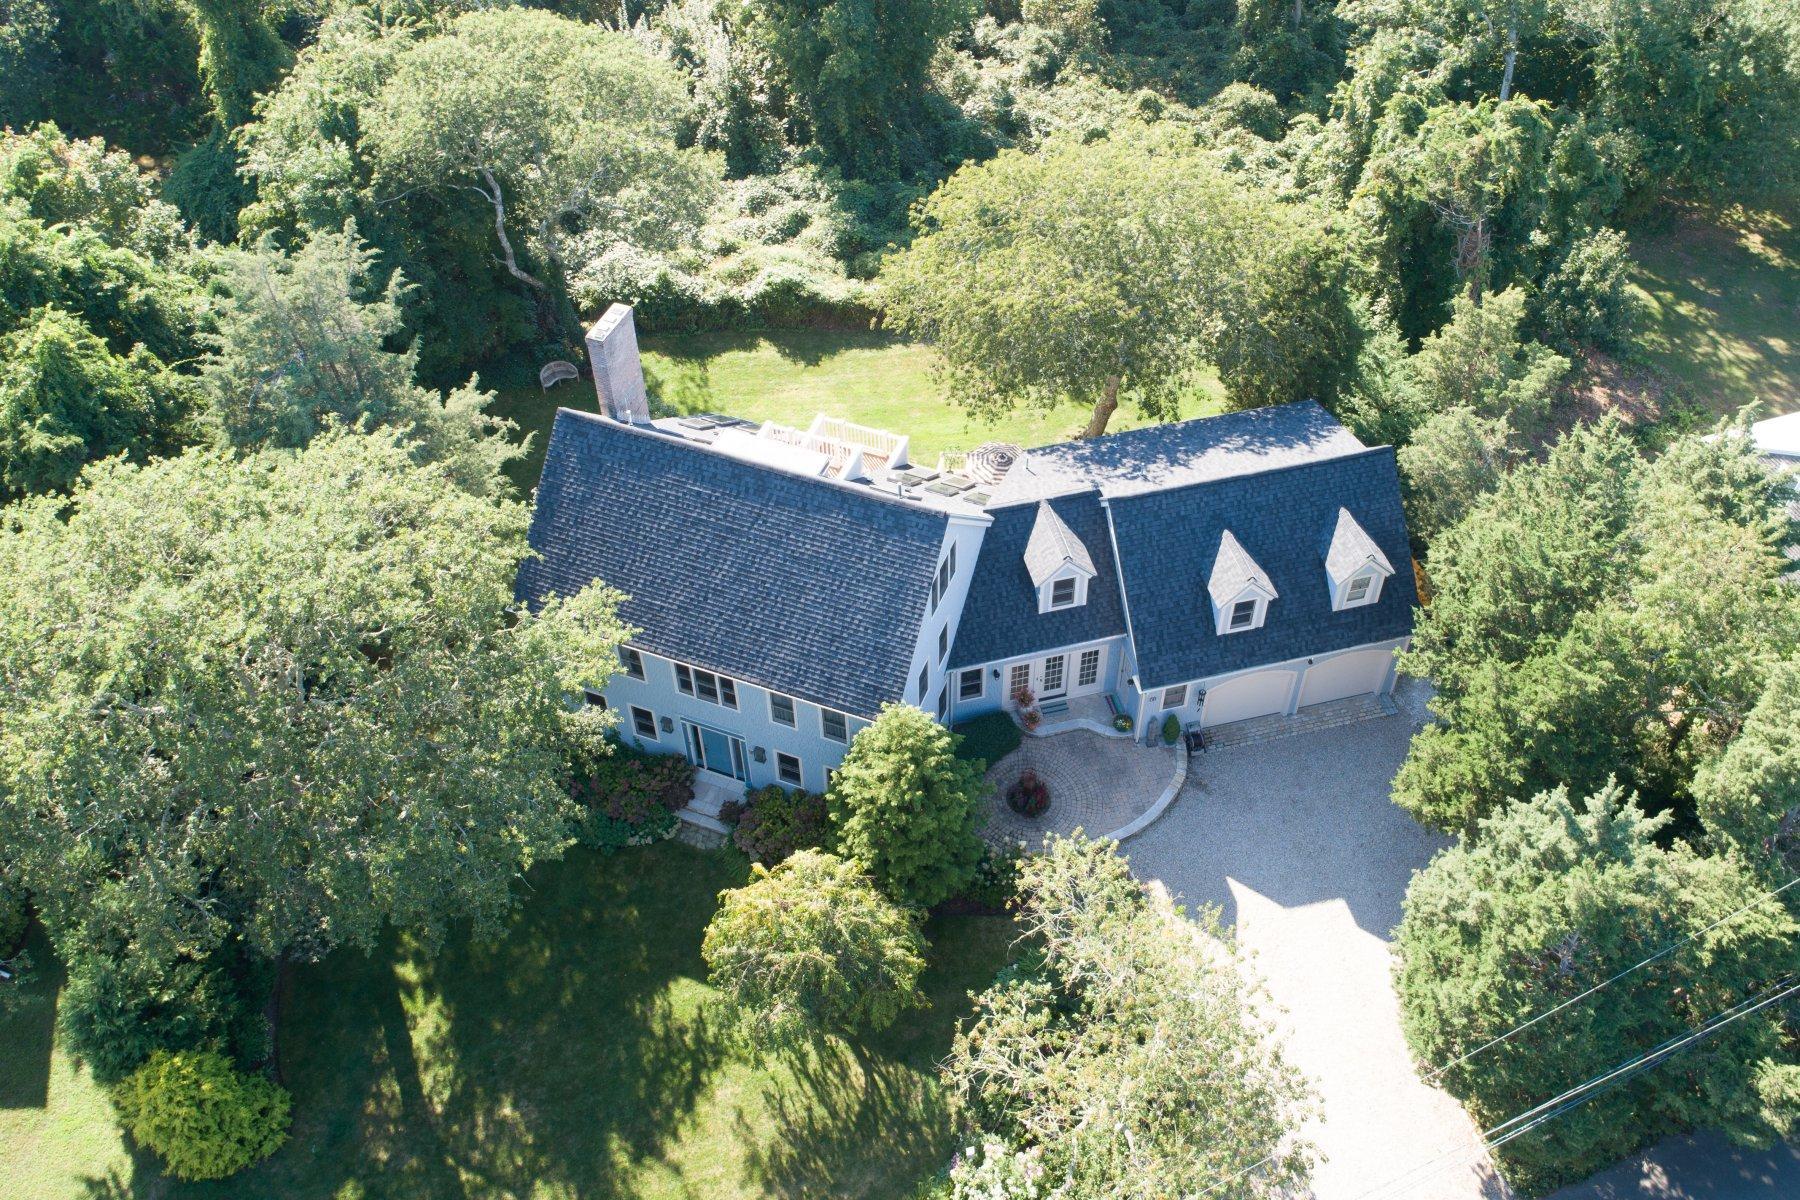 Single Family Homes για την Πώληση στο 35 Sea Meadow Lane, Brewster, MA Brewster, Μασαχουσετη 02631 Ηνωμένες Πολιτείες